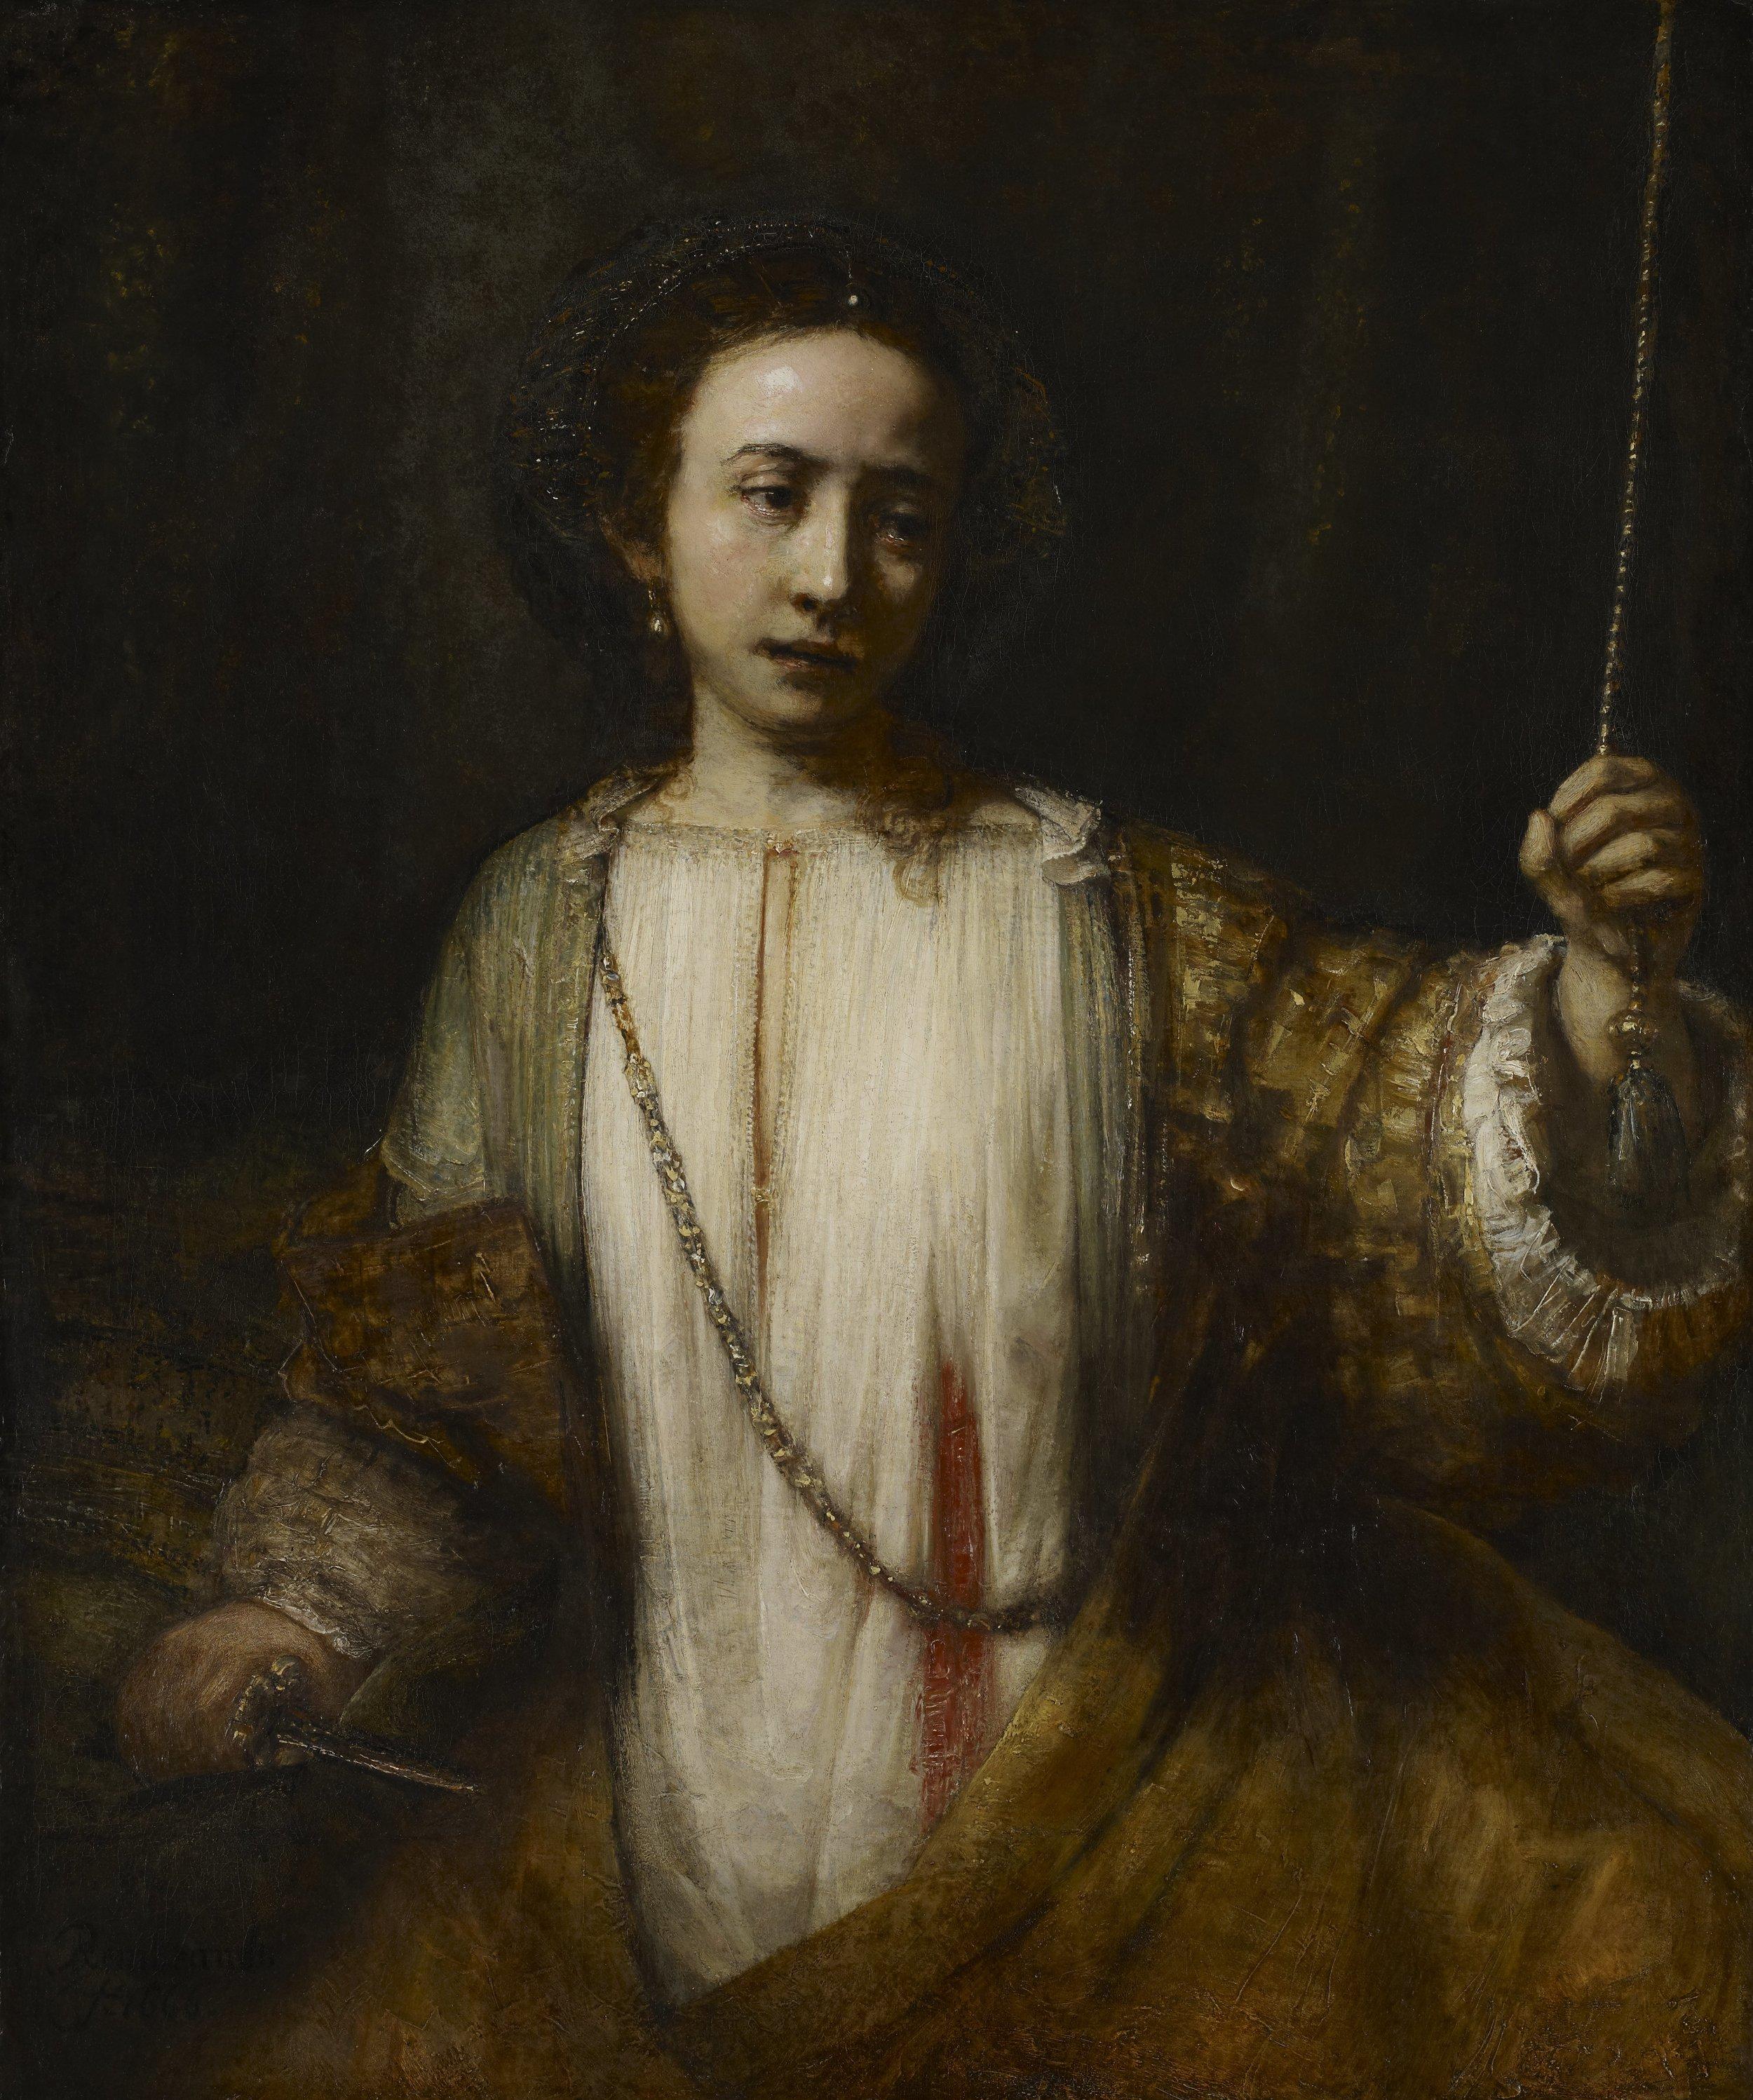 "Rembrandt van Rijn.  Lucretia.  Oil on Canvas. 43.4 x 36.3"". 1666."